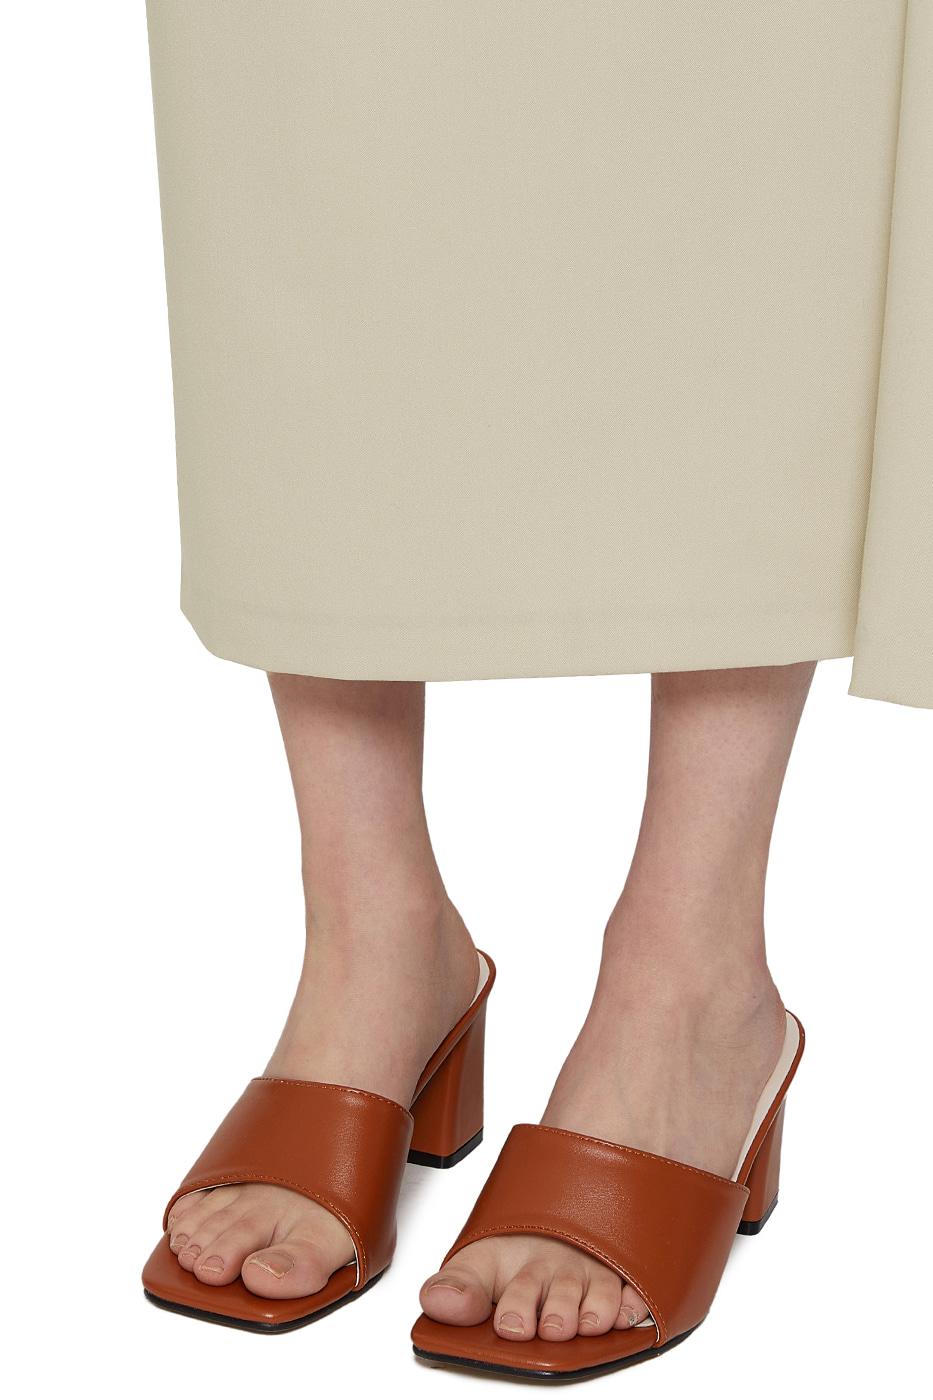 Troy high heel sandals